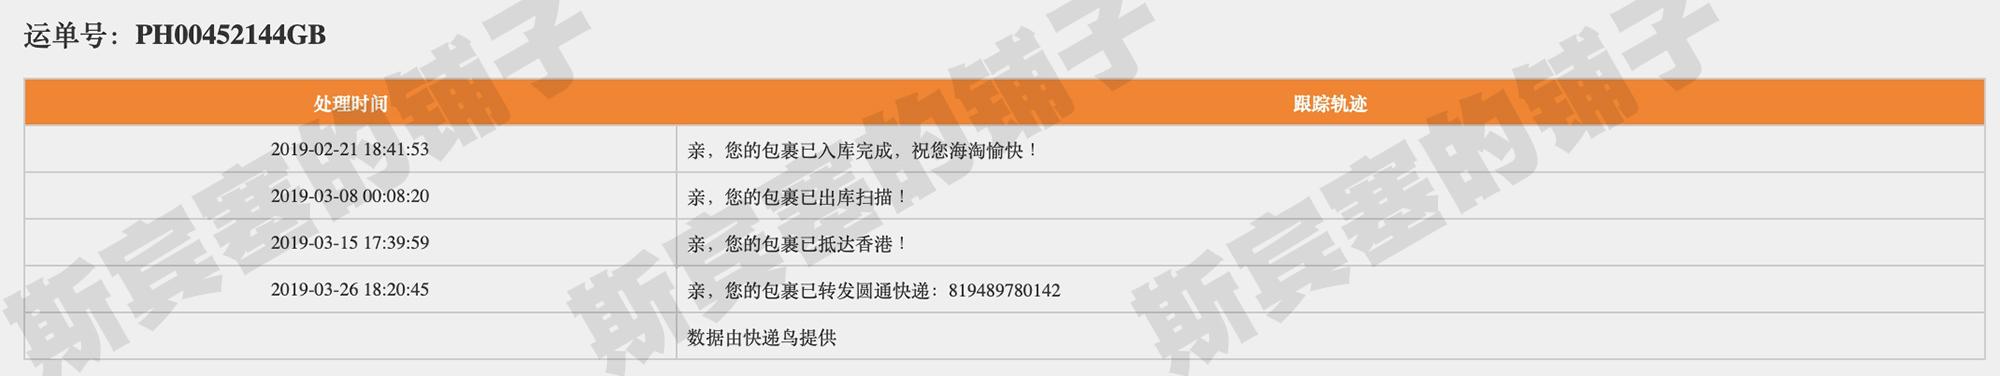 Xnip2019-04-23_21-42-08副本.jpg